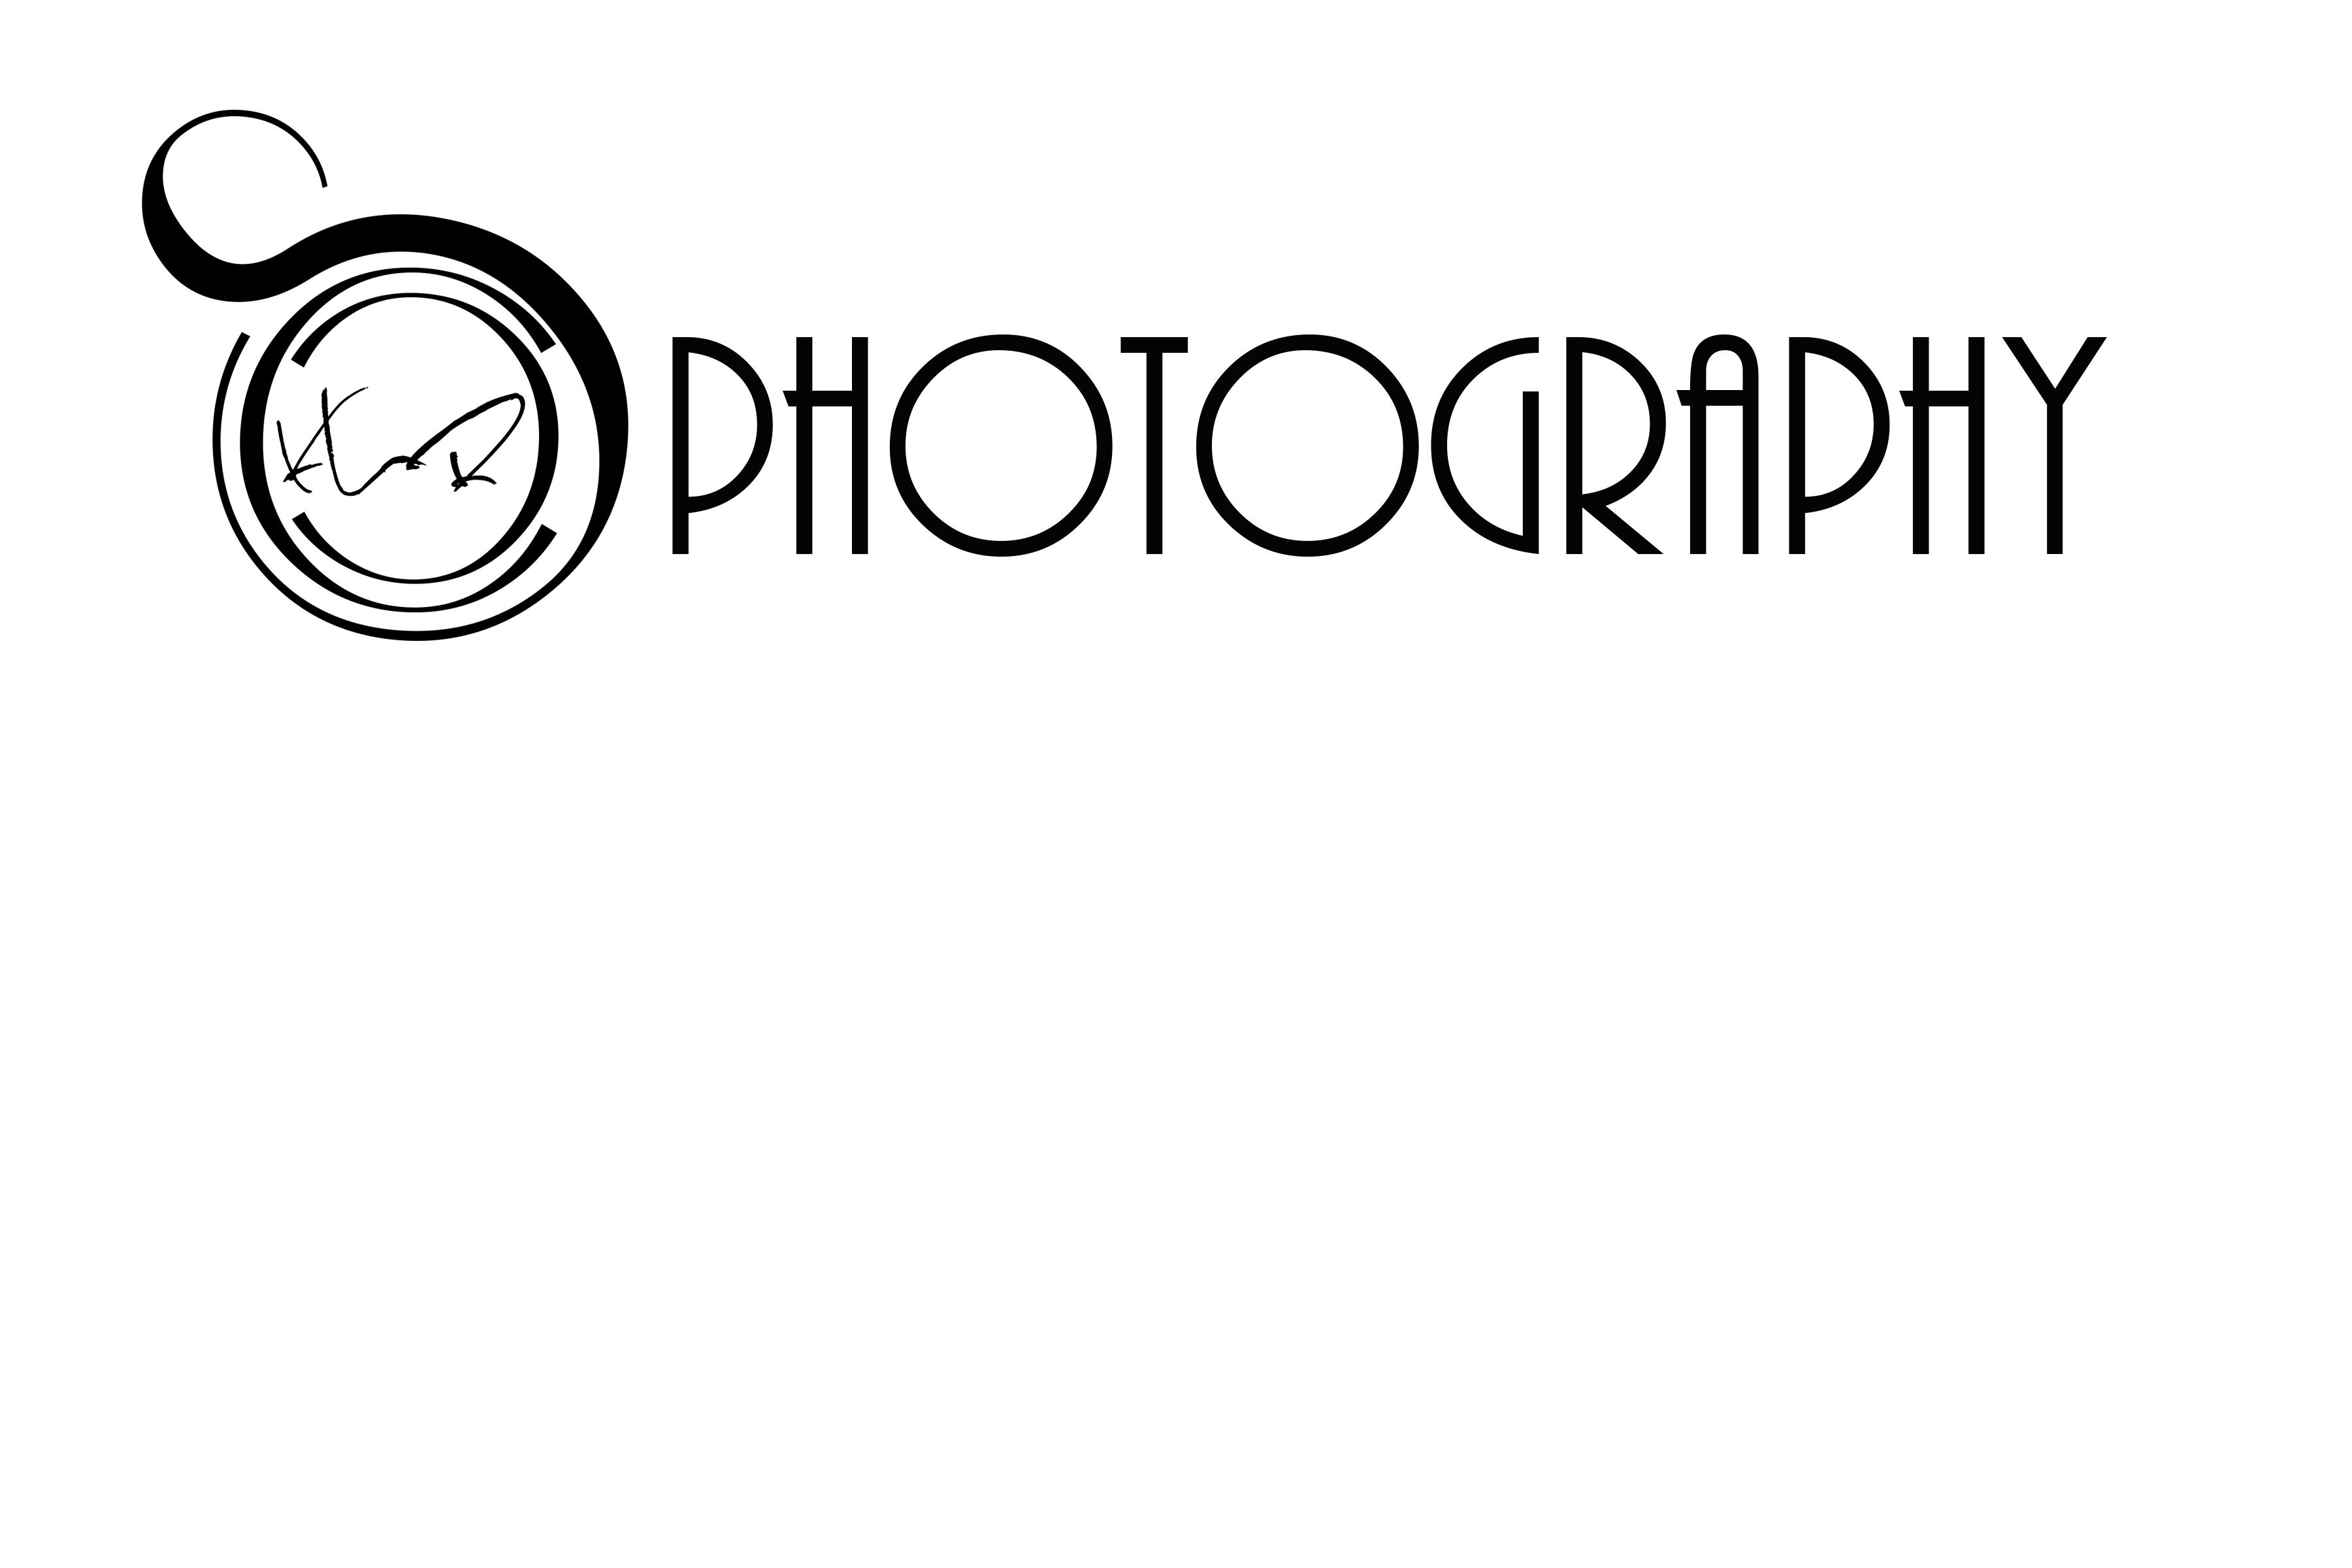 KLR Photography